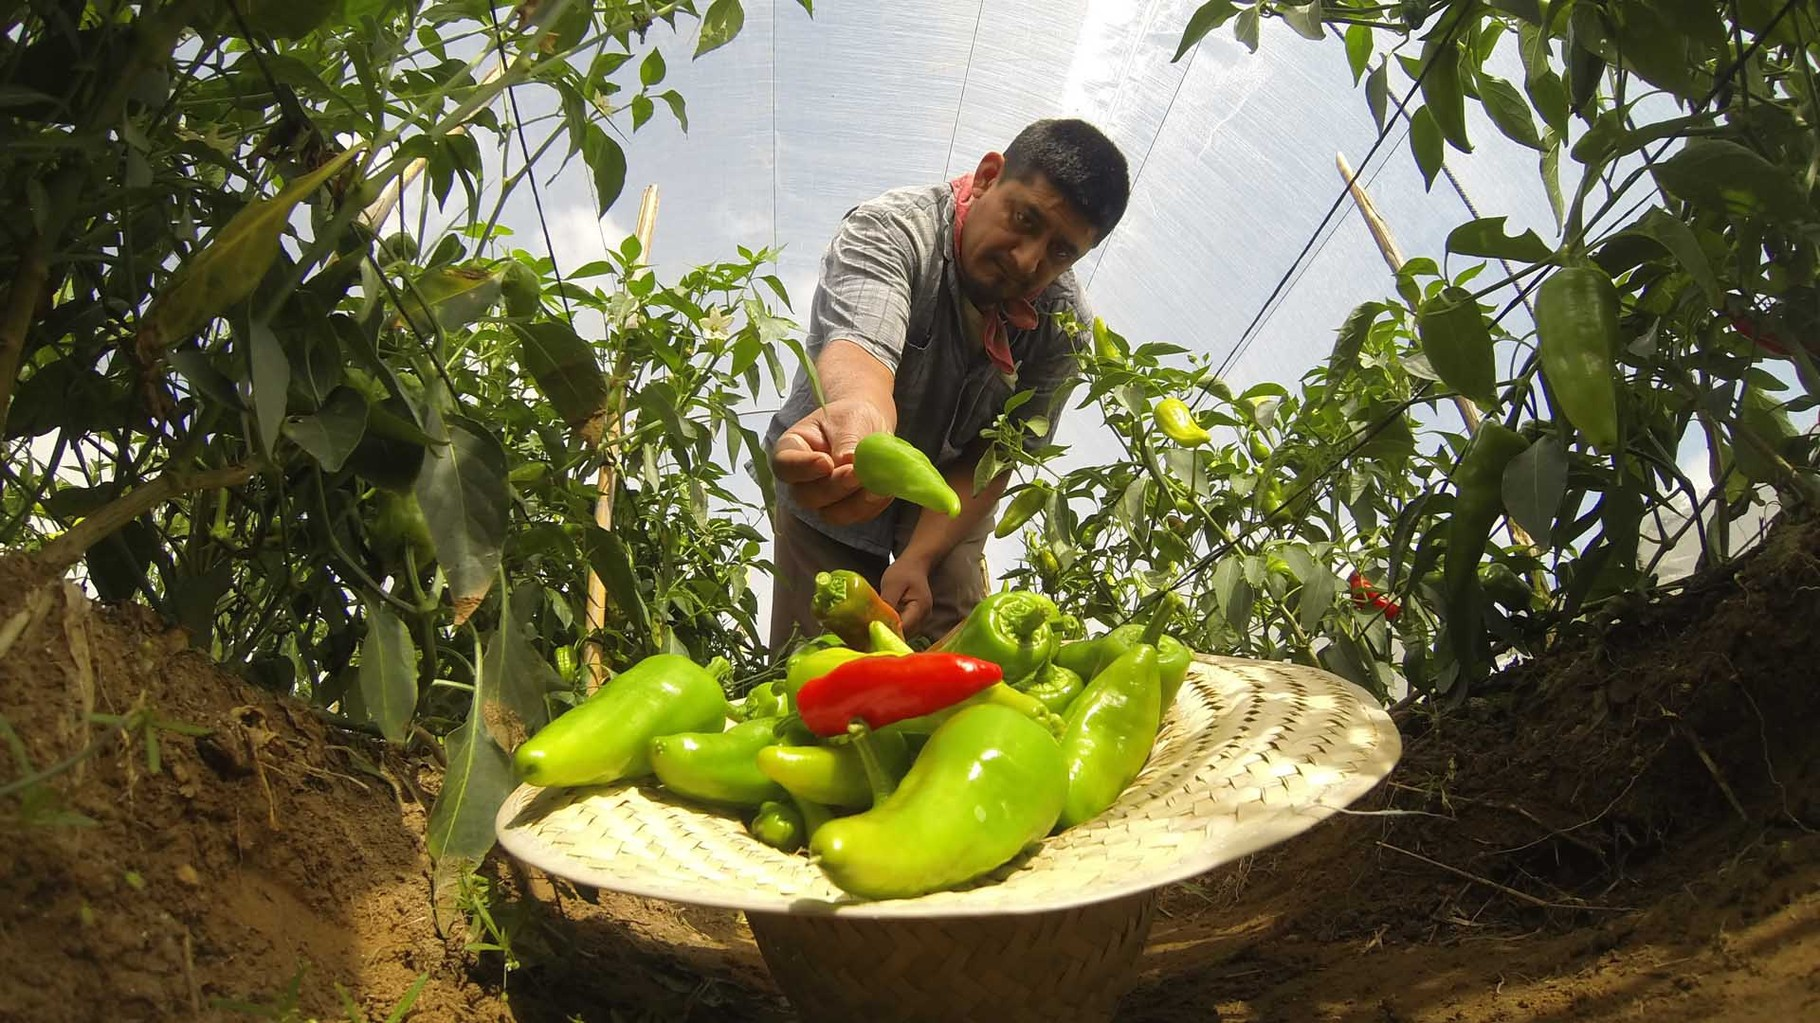 Salsa Macha de chiles chipotles - Macuilis: Mermeladas, Salsas & Conservas  Artesanales- Gourmet